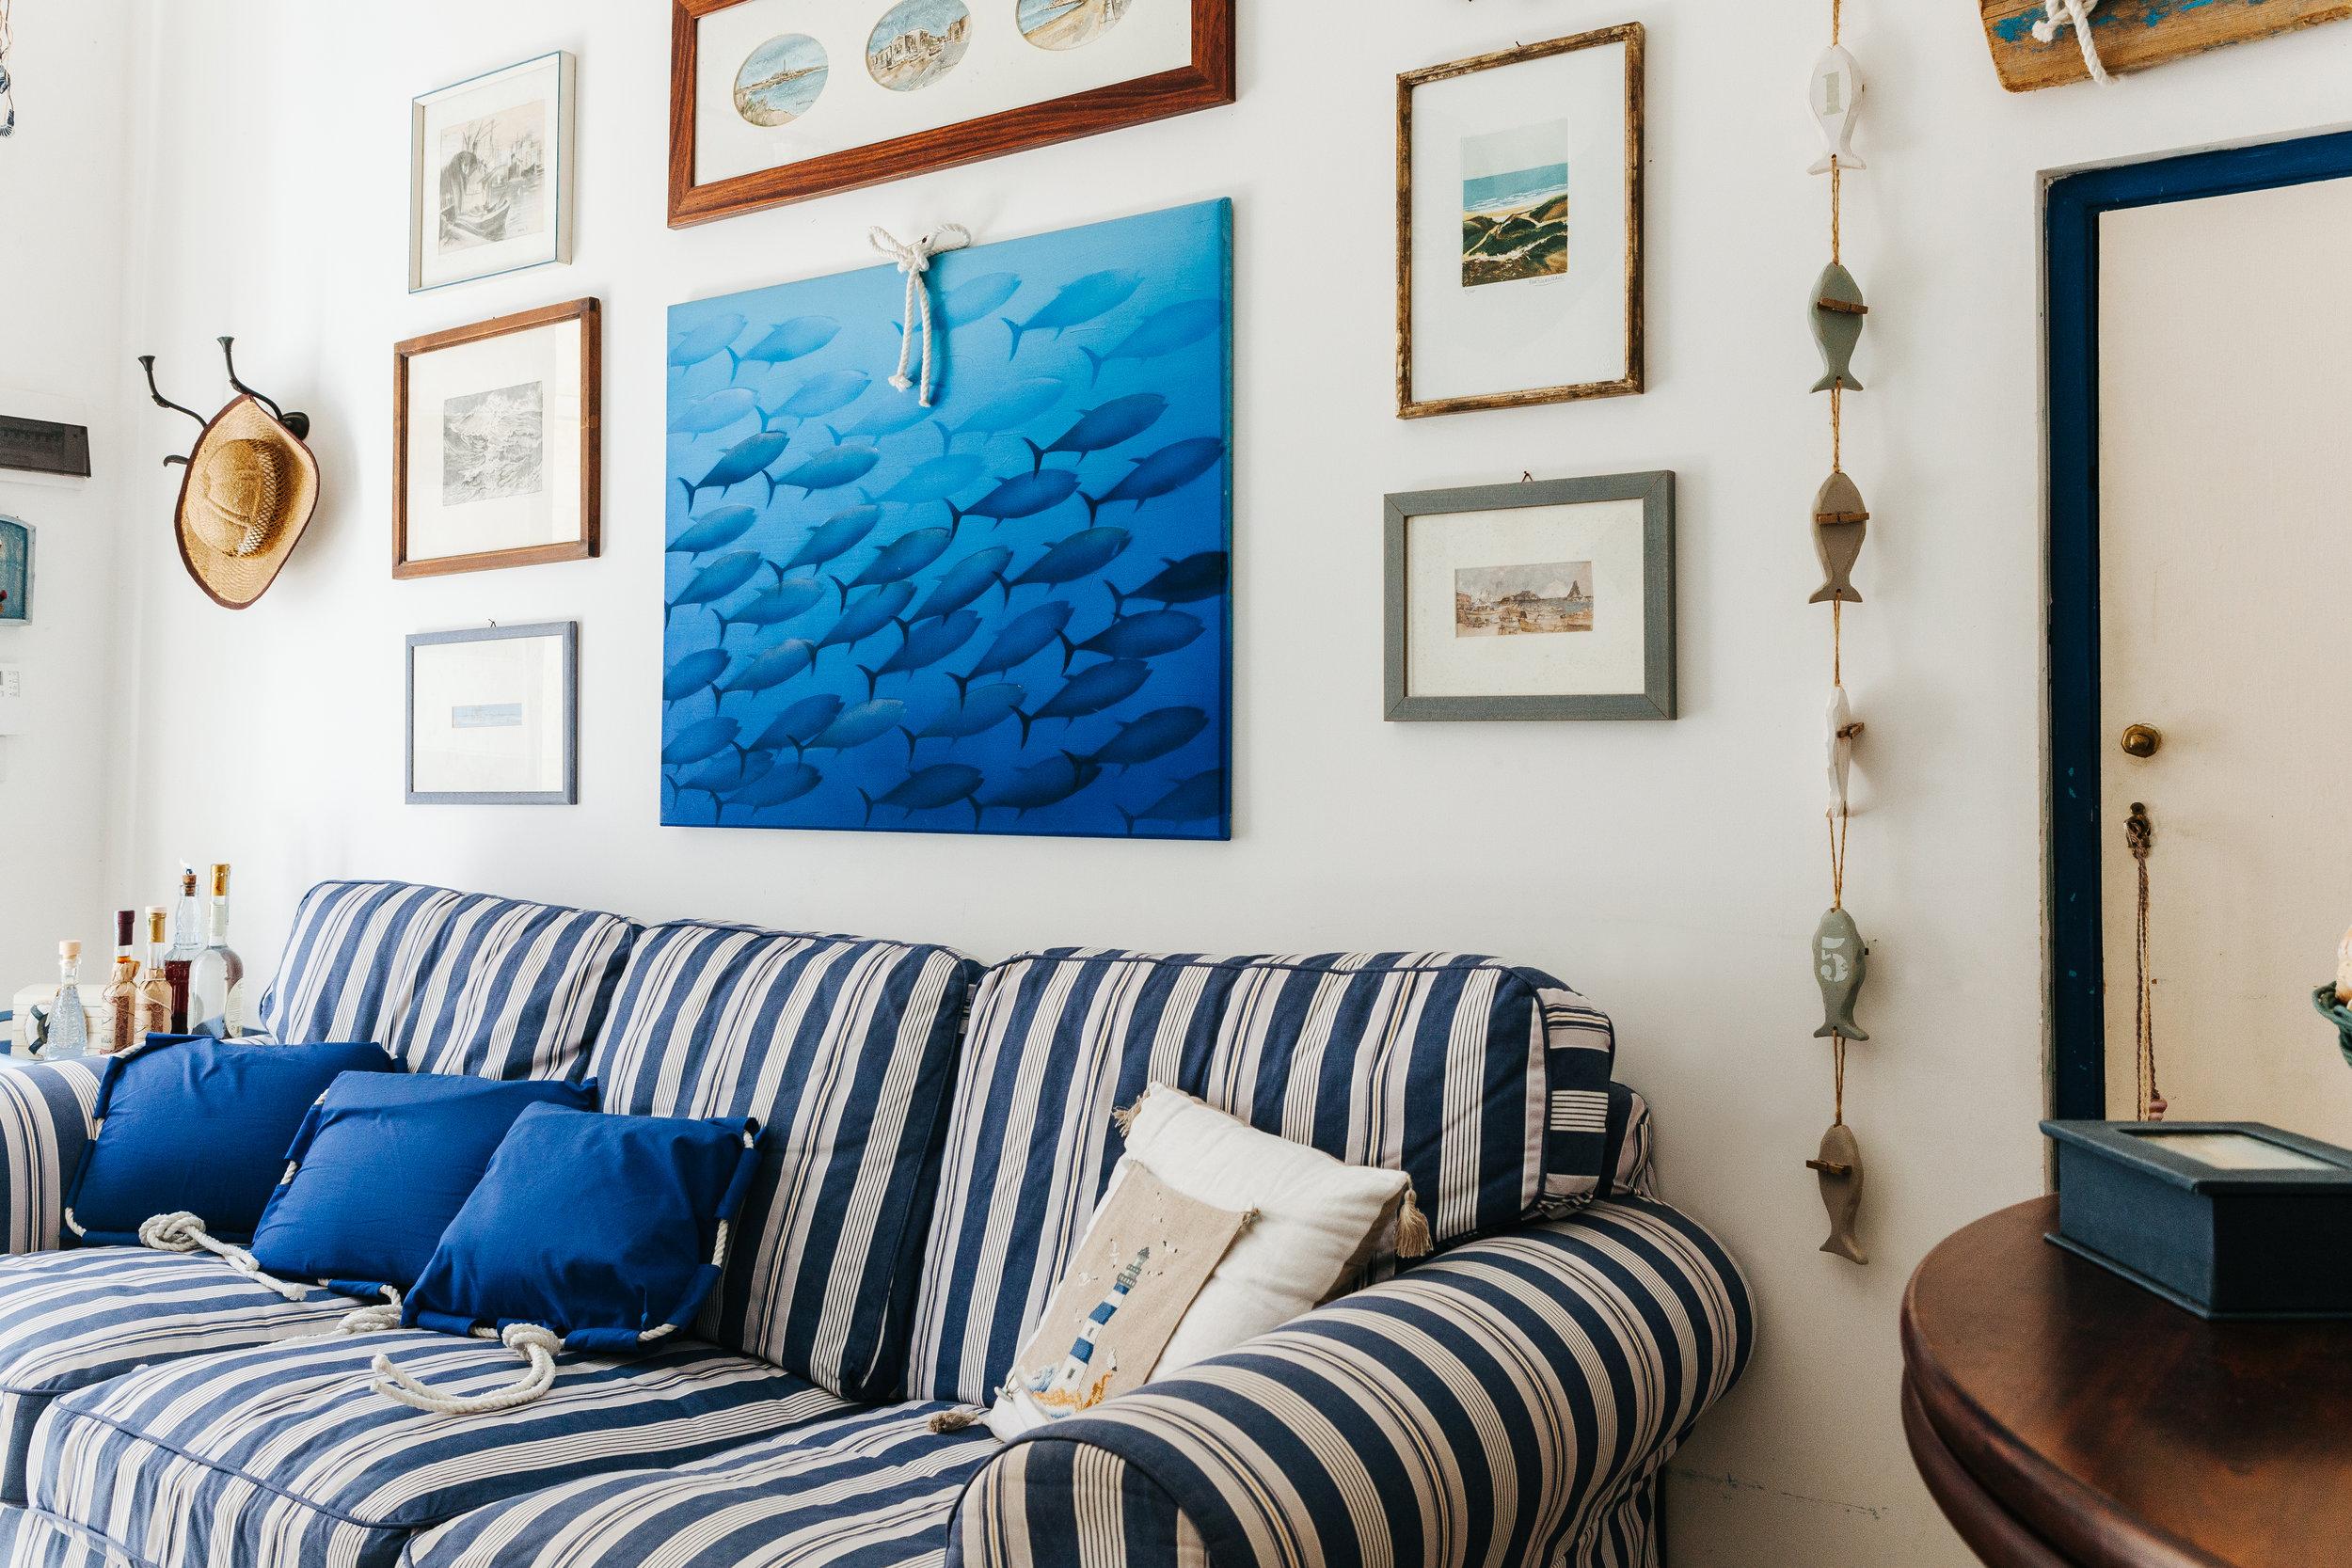 5sampieri-casa-vacanze-sicilia-appartamento-sicily-holiday-apartment-casazzurra-italia-italy.jpg